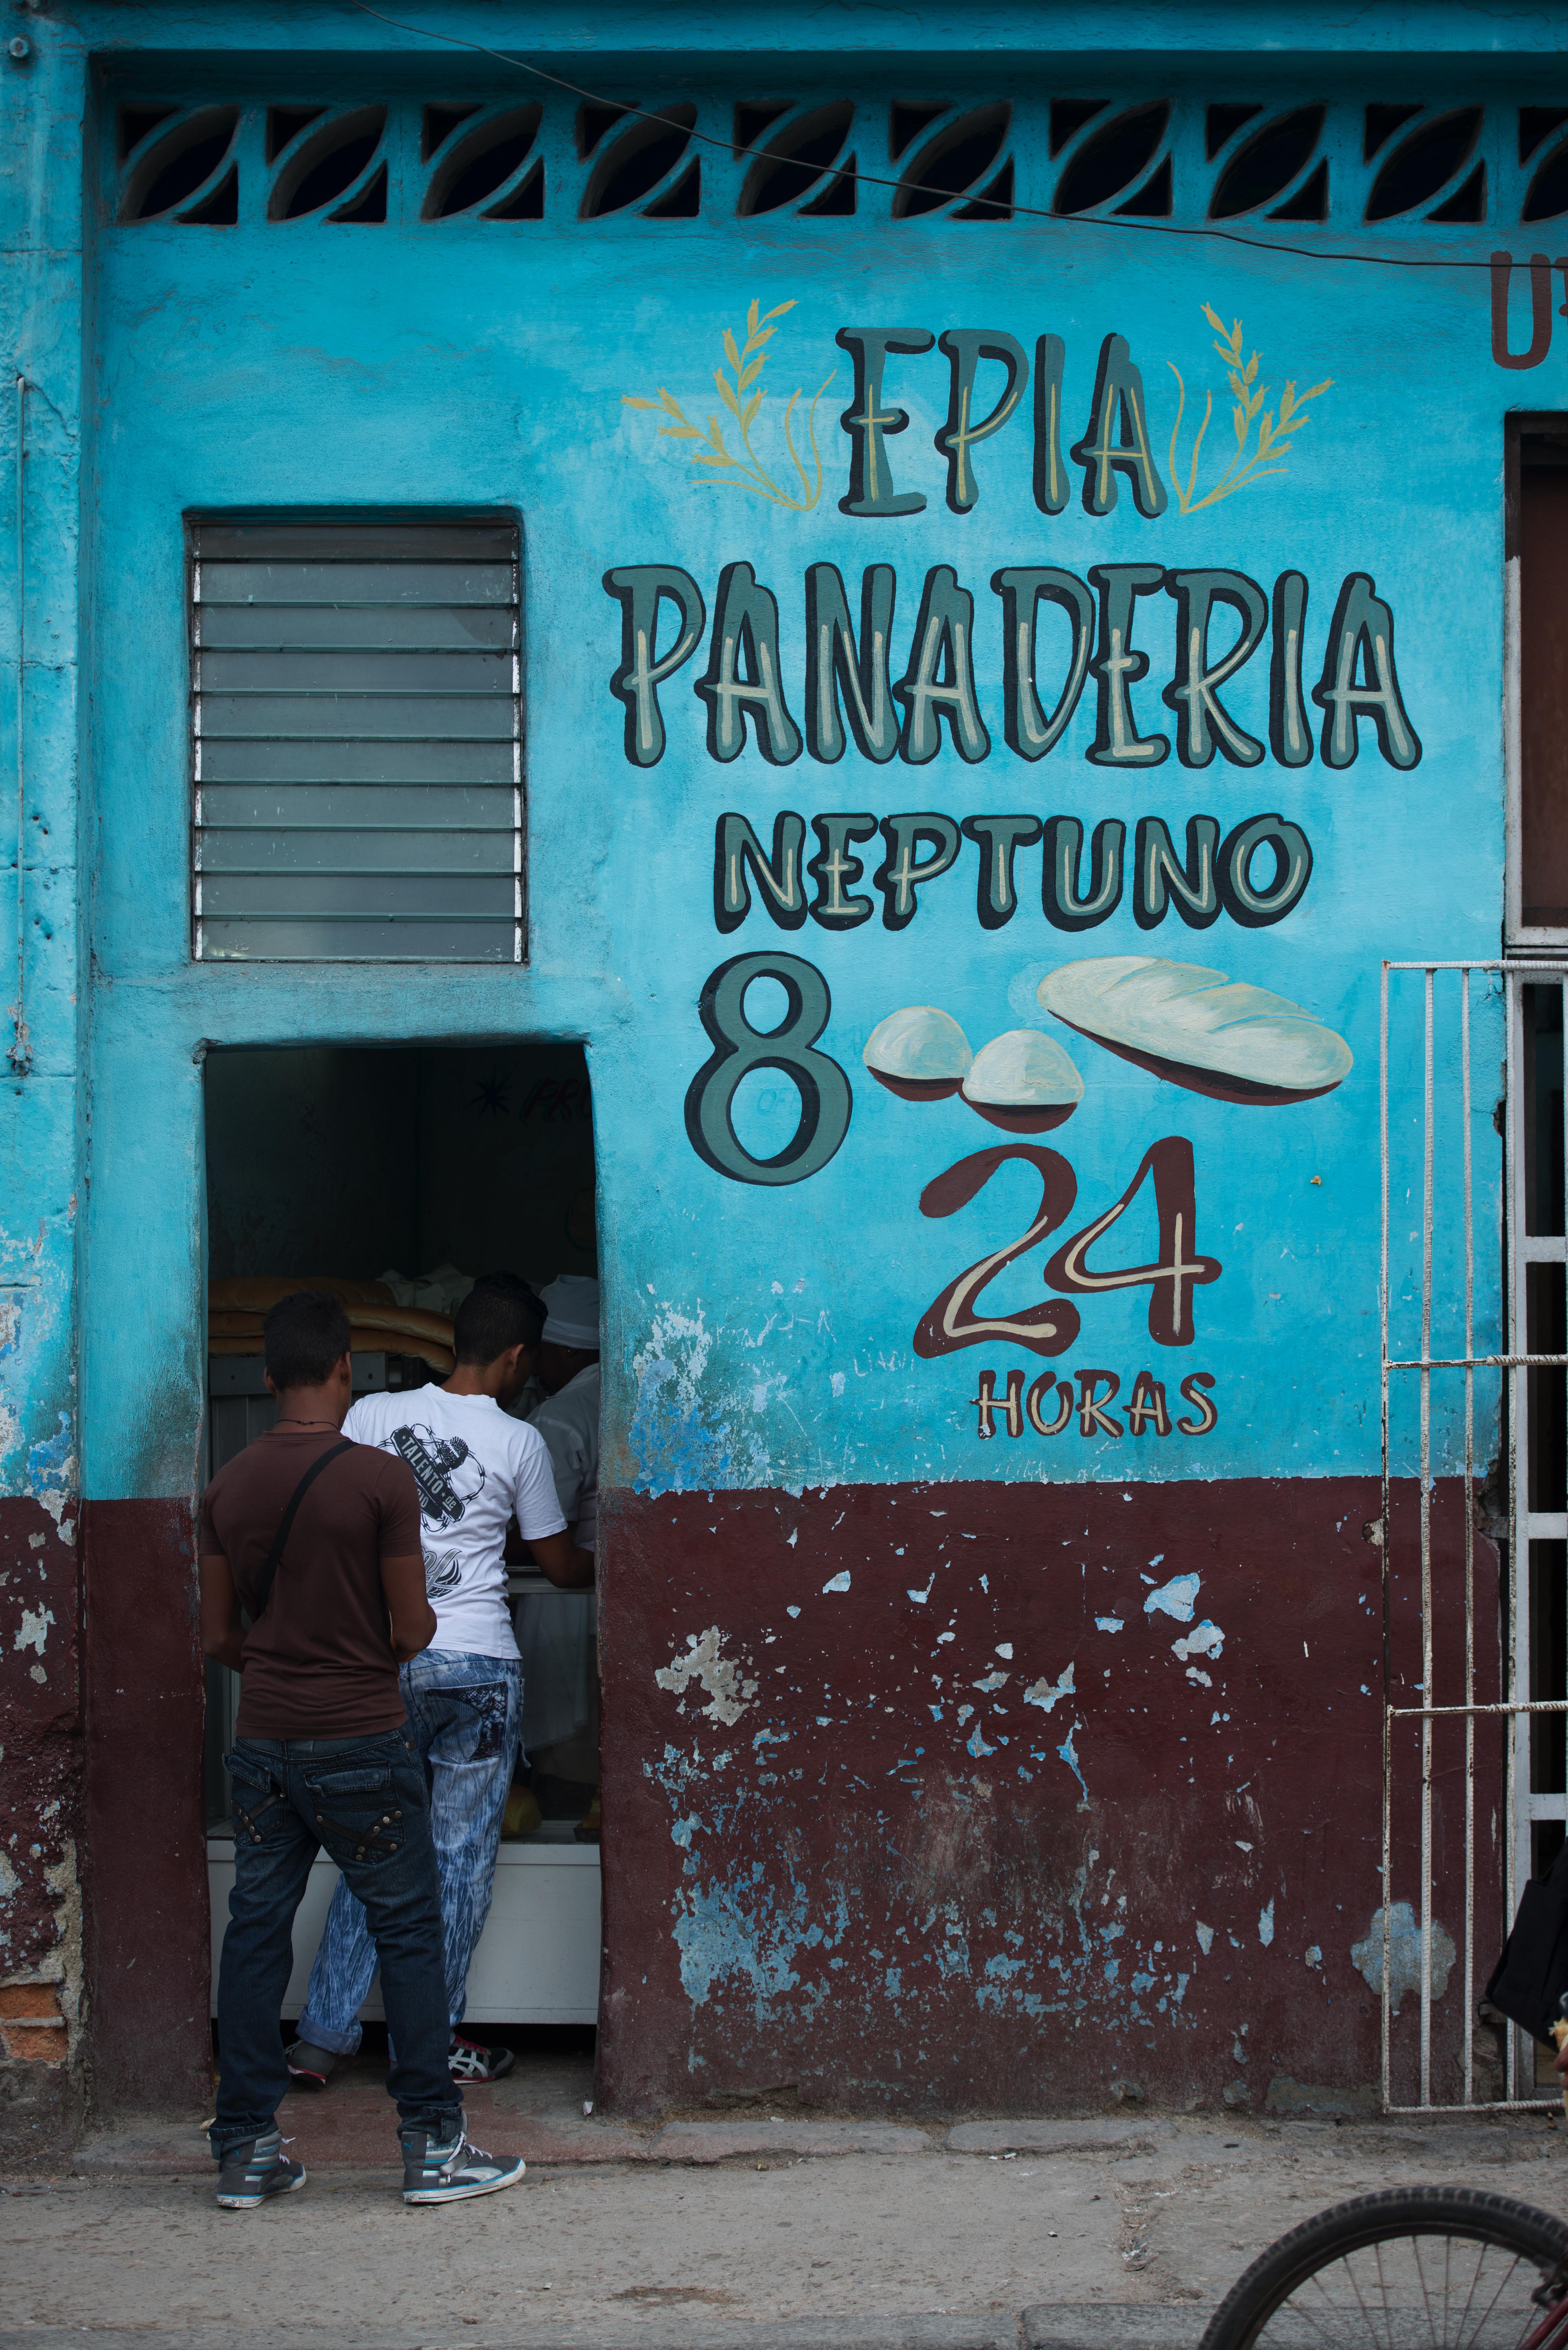 Habana_panaderia_2819Habana_panaderialow